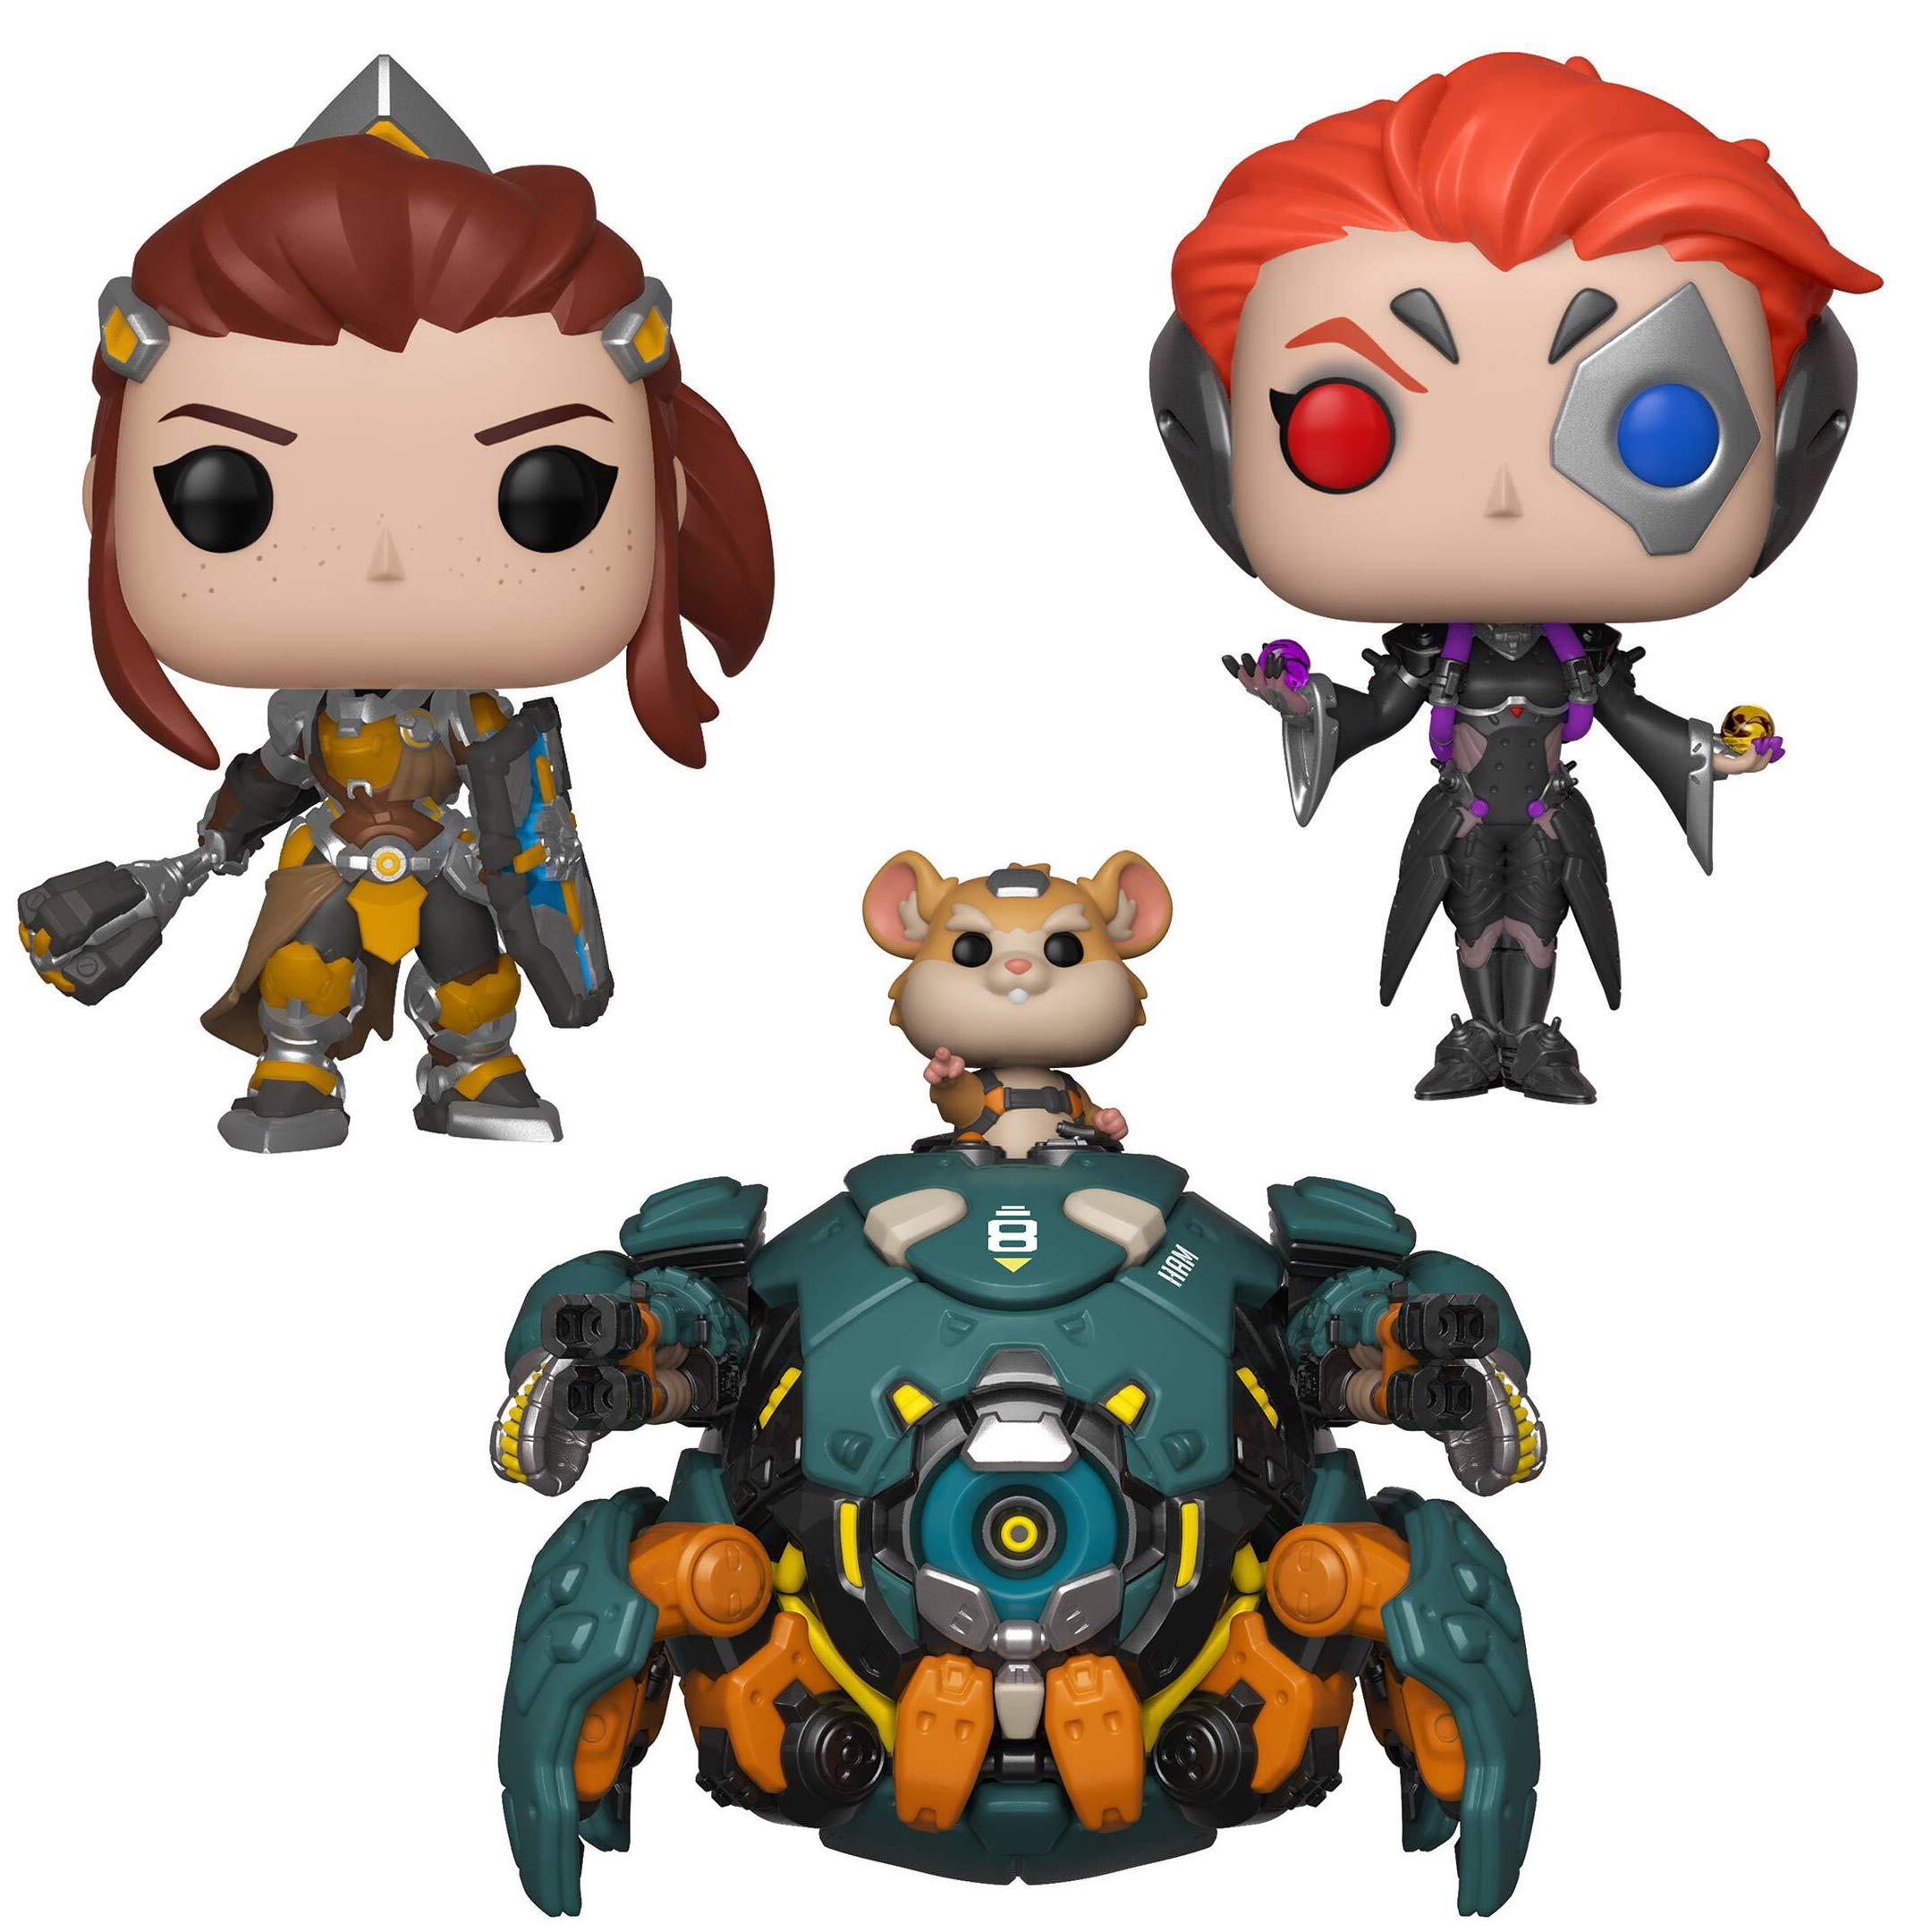 Funko Games: POP! Overwatch Series 5 Collectors Set - 6'' Wrecking Ball, Brigitte, Moira